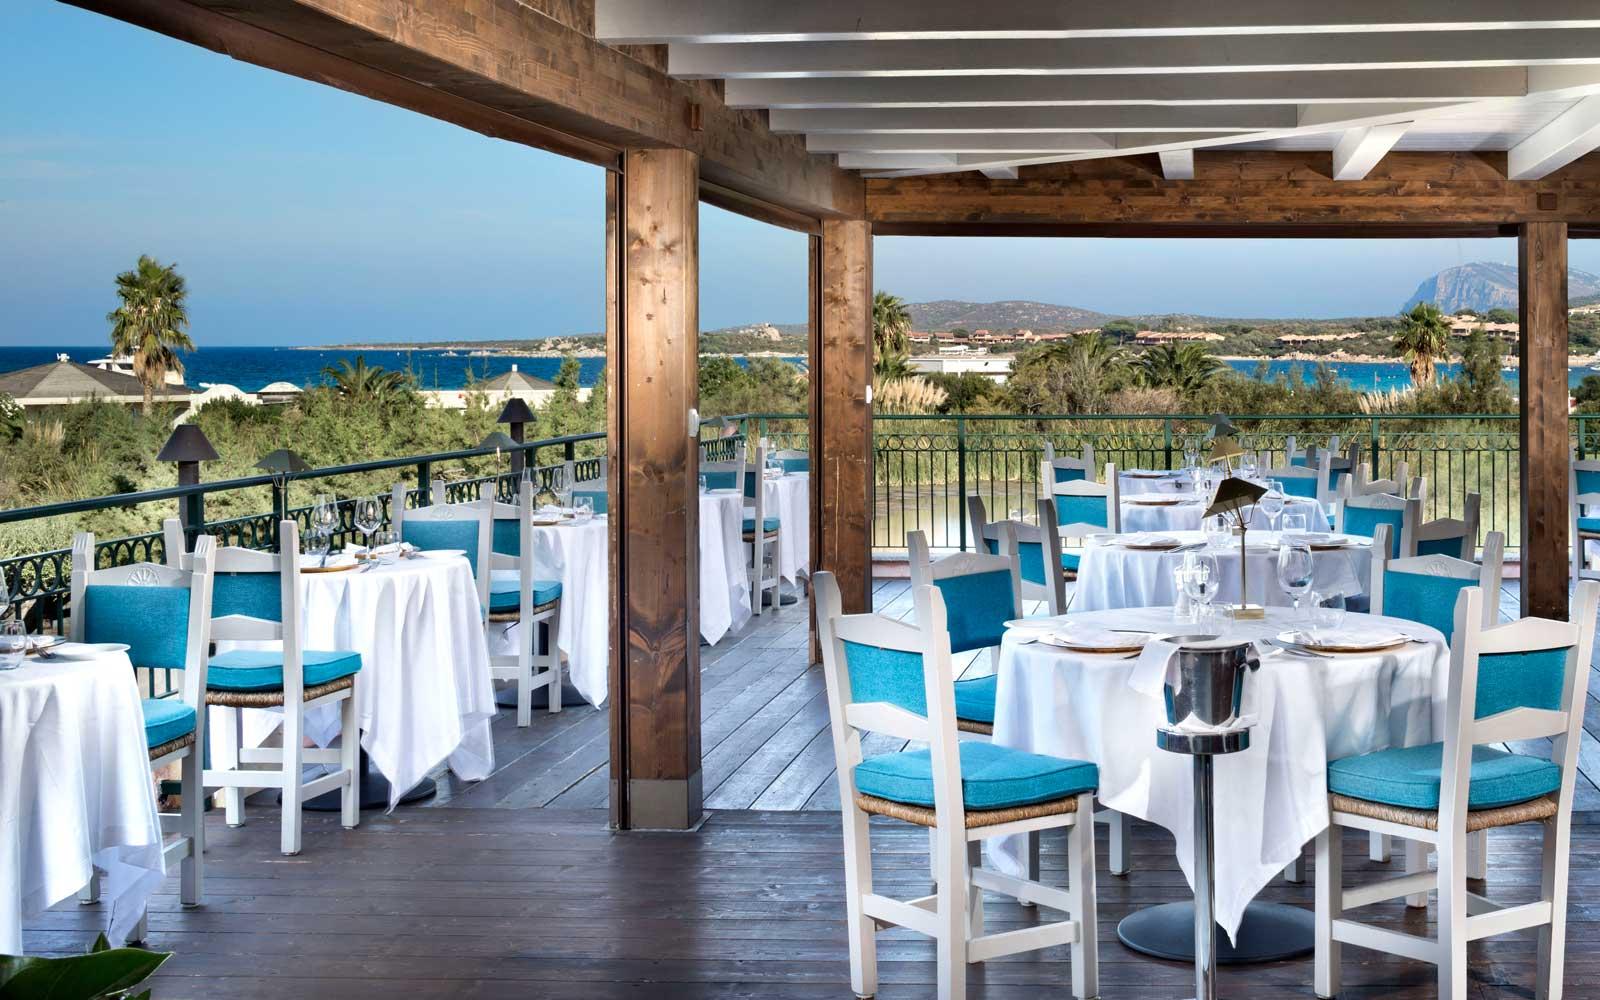 Gourmet Restaurant at Hotel Abi D'oru